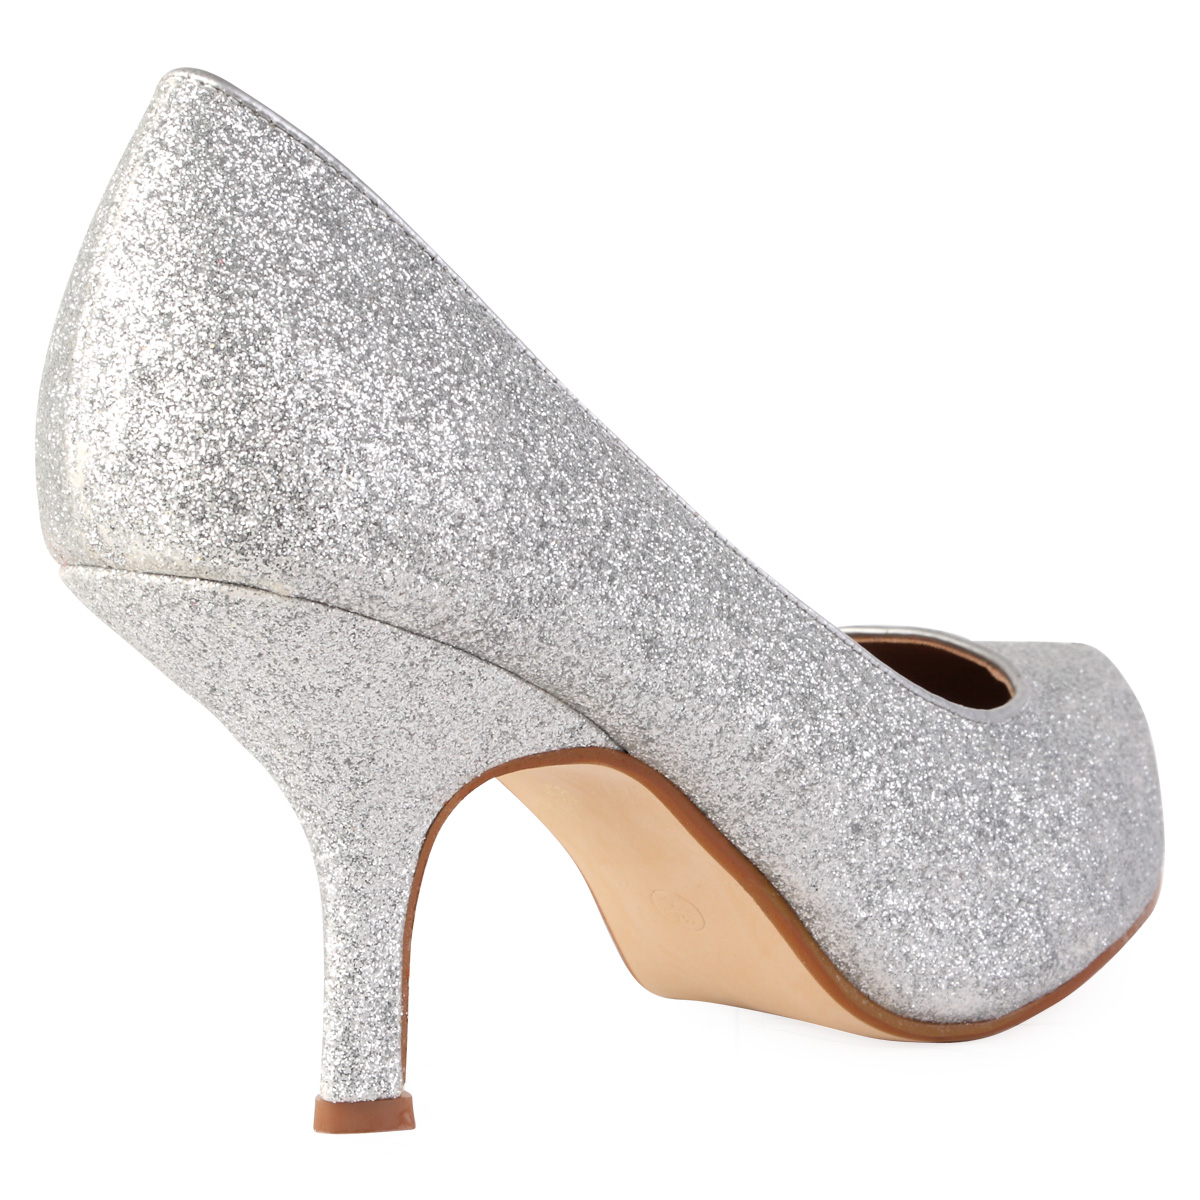 new womens silver glitter platform stiletto heel